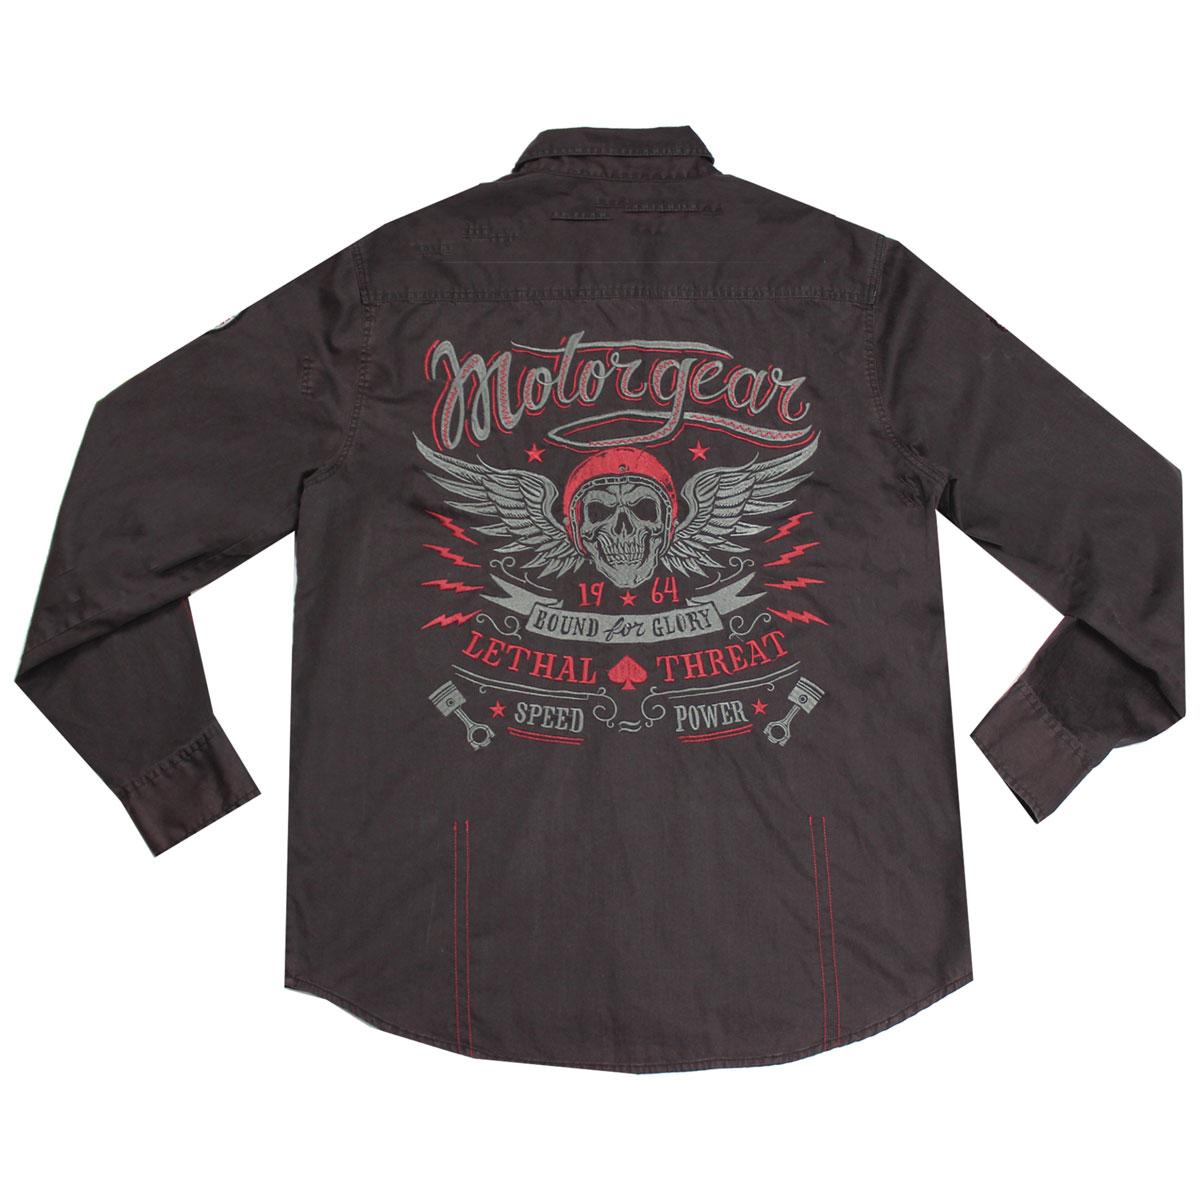 Lethal Threat Men's Speed Power Black Button Down Shirt